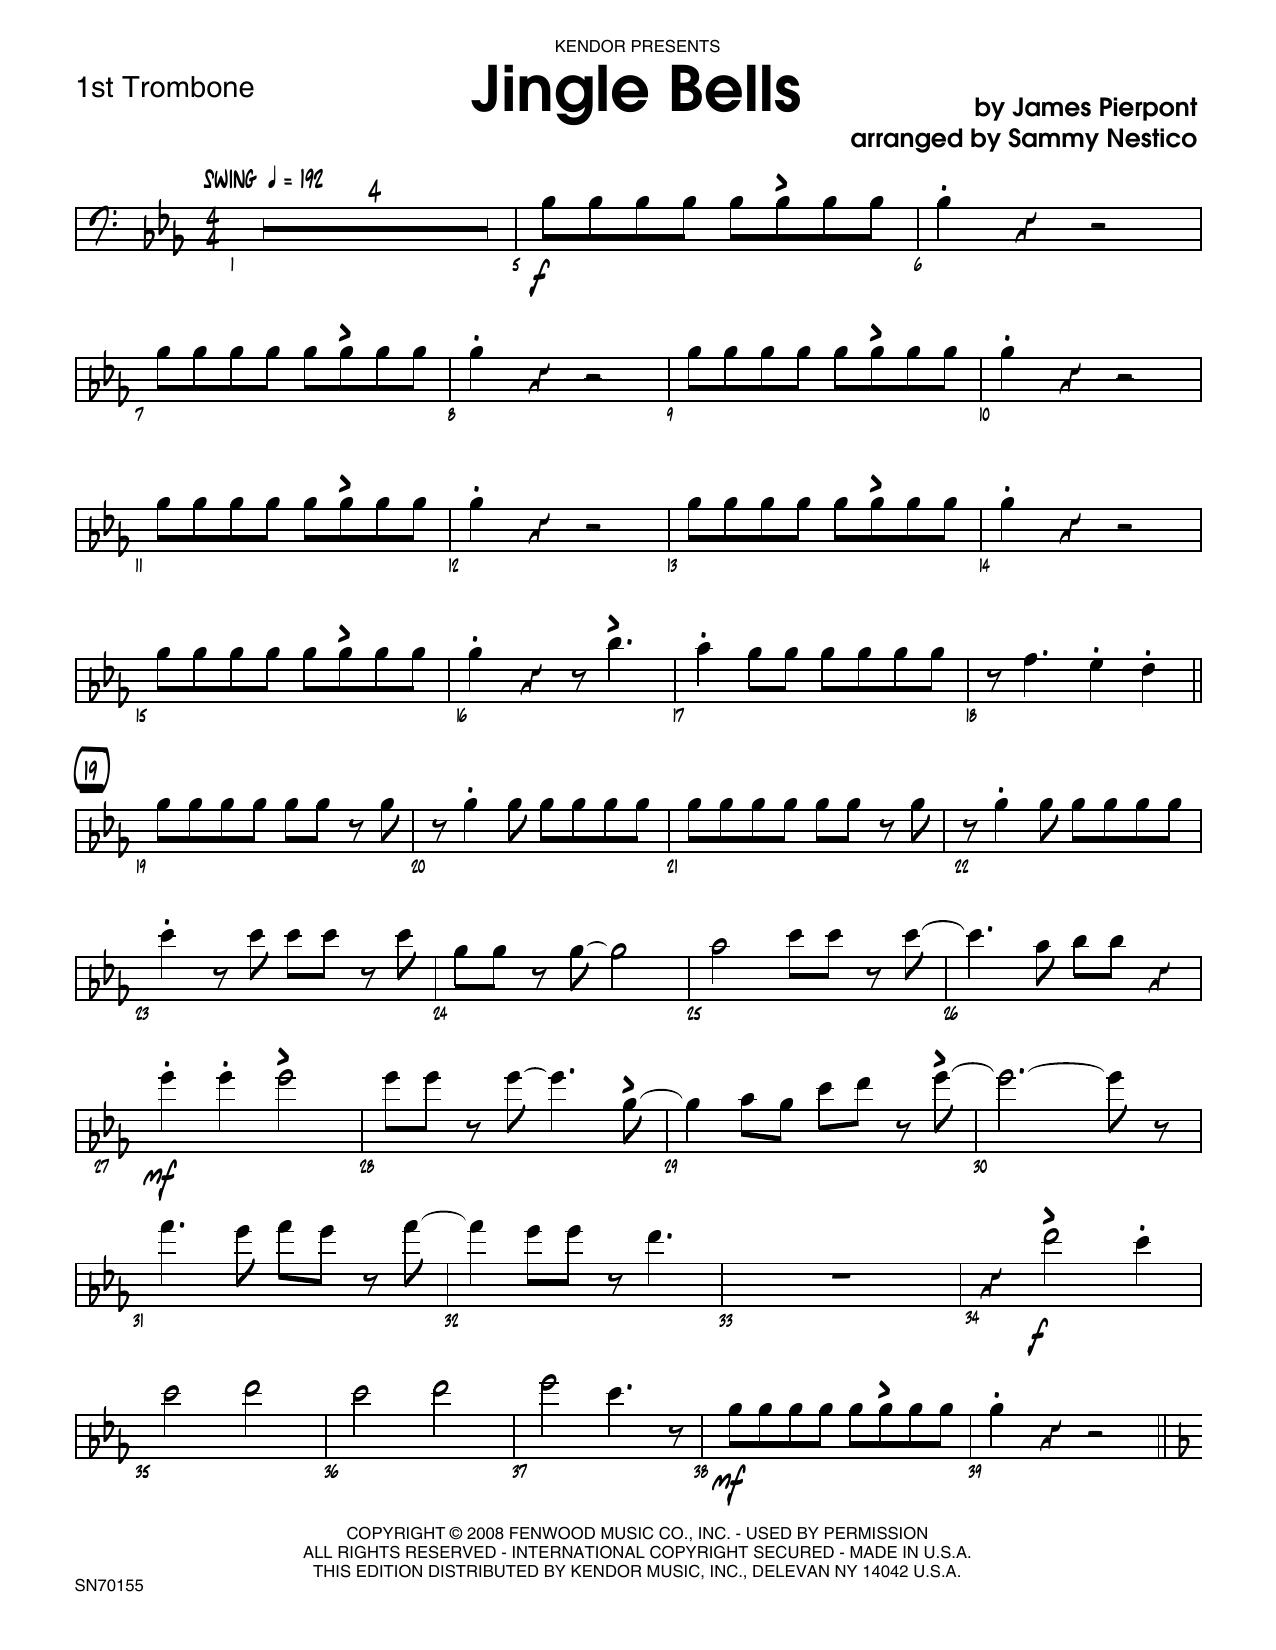 Jingle Bells - 1st Trombone Sheet Music